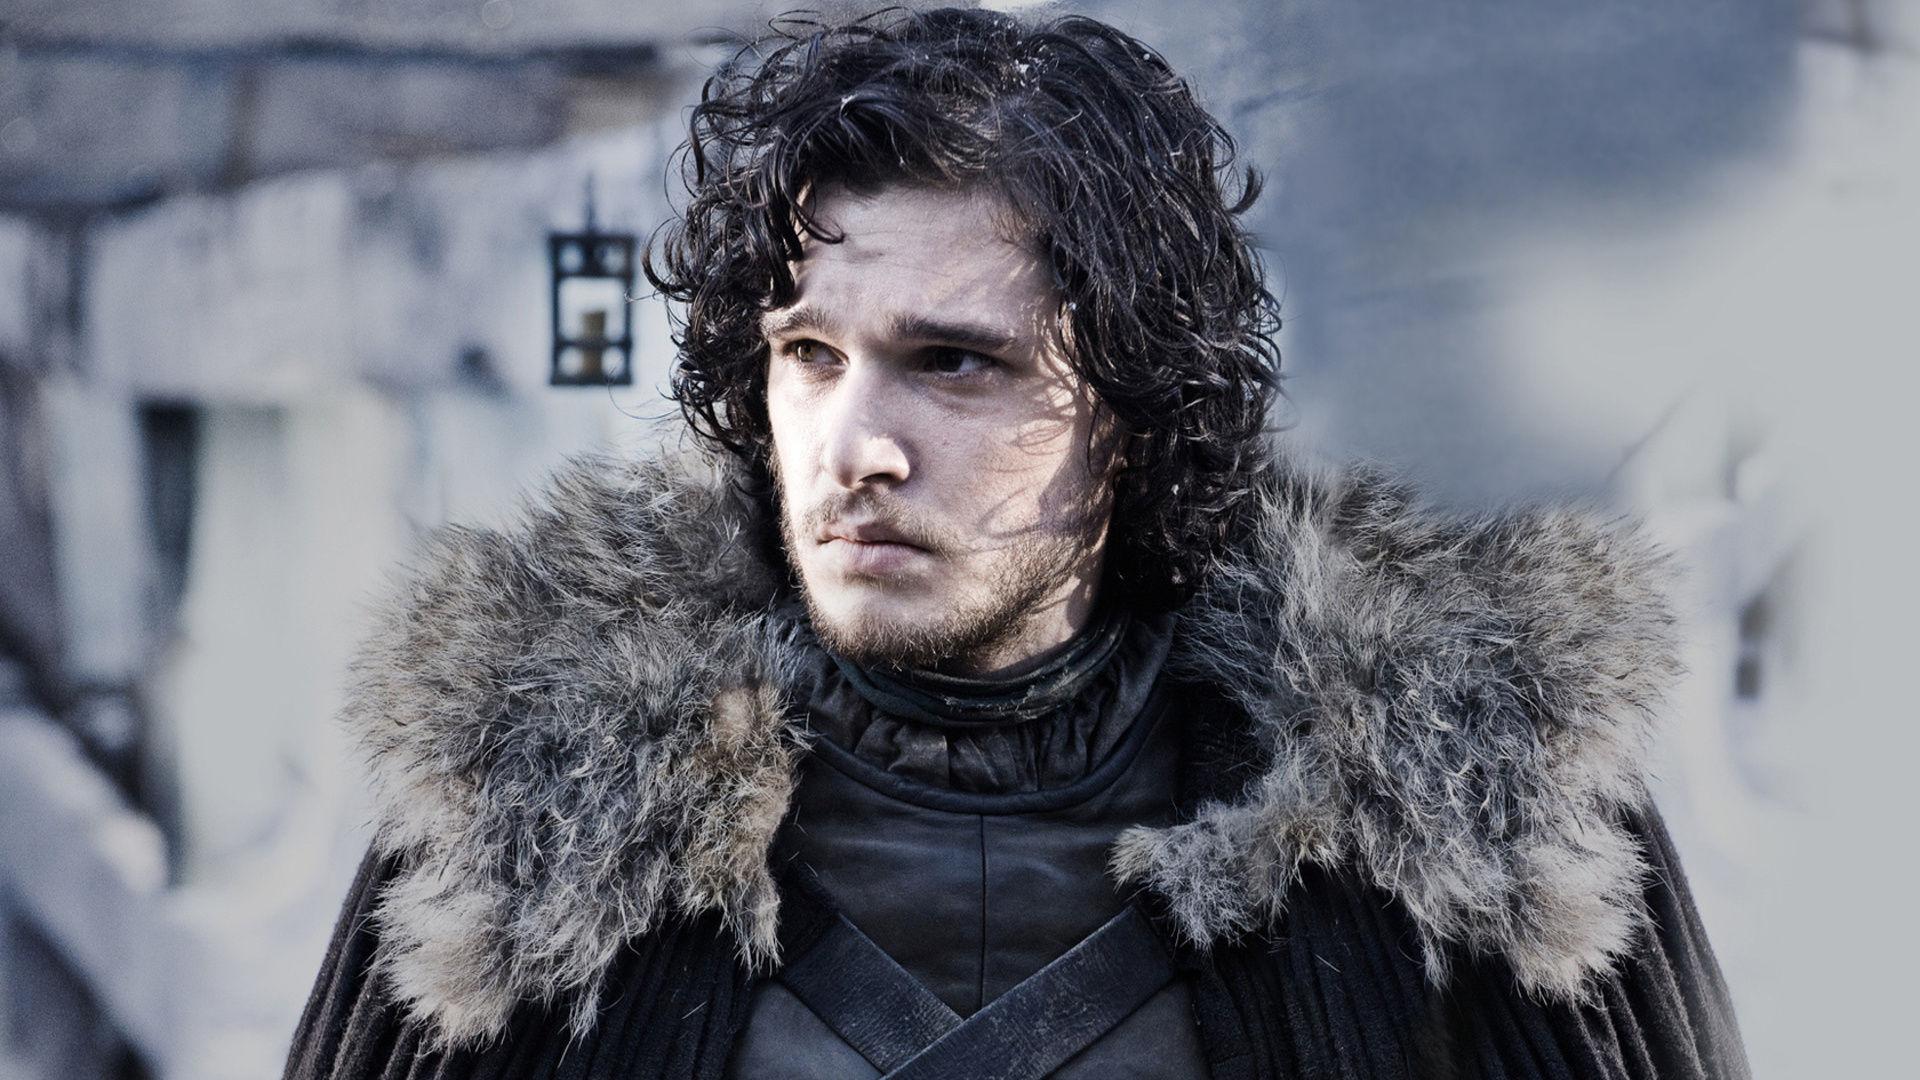 game-of-thrones-season-5-kit-harington-as-jon-snow